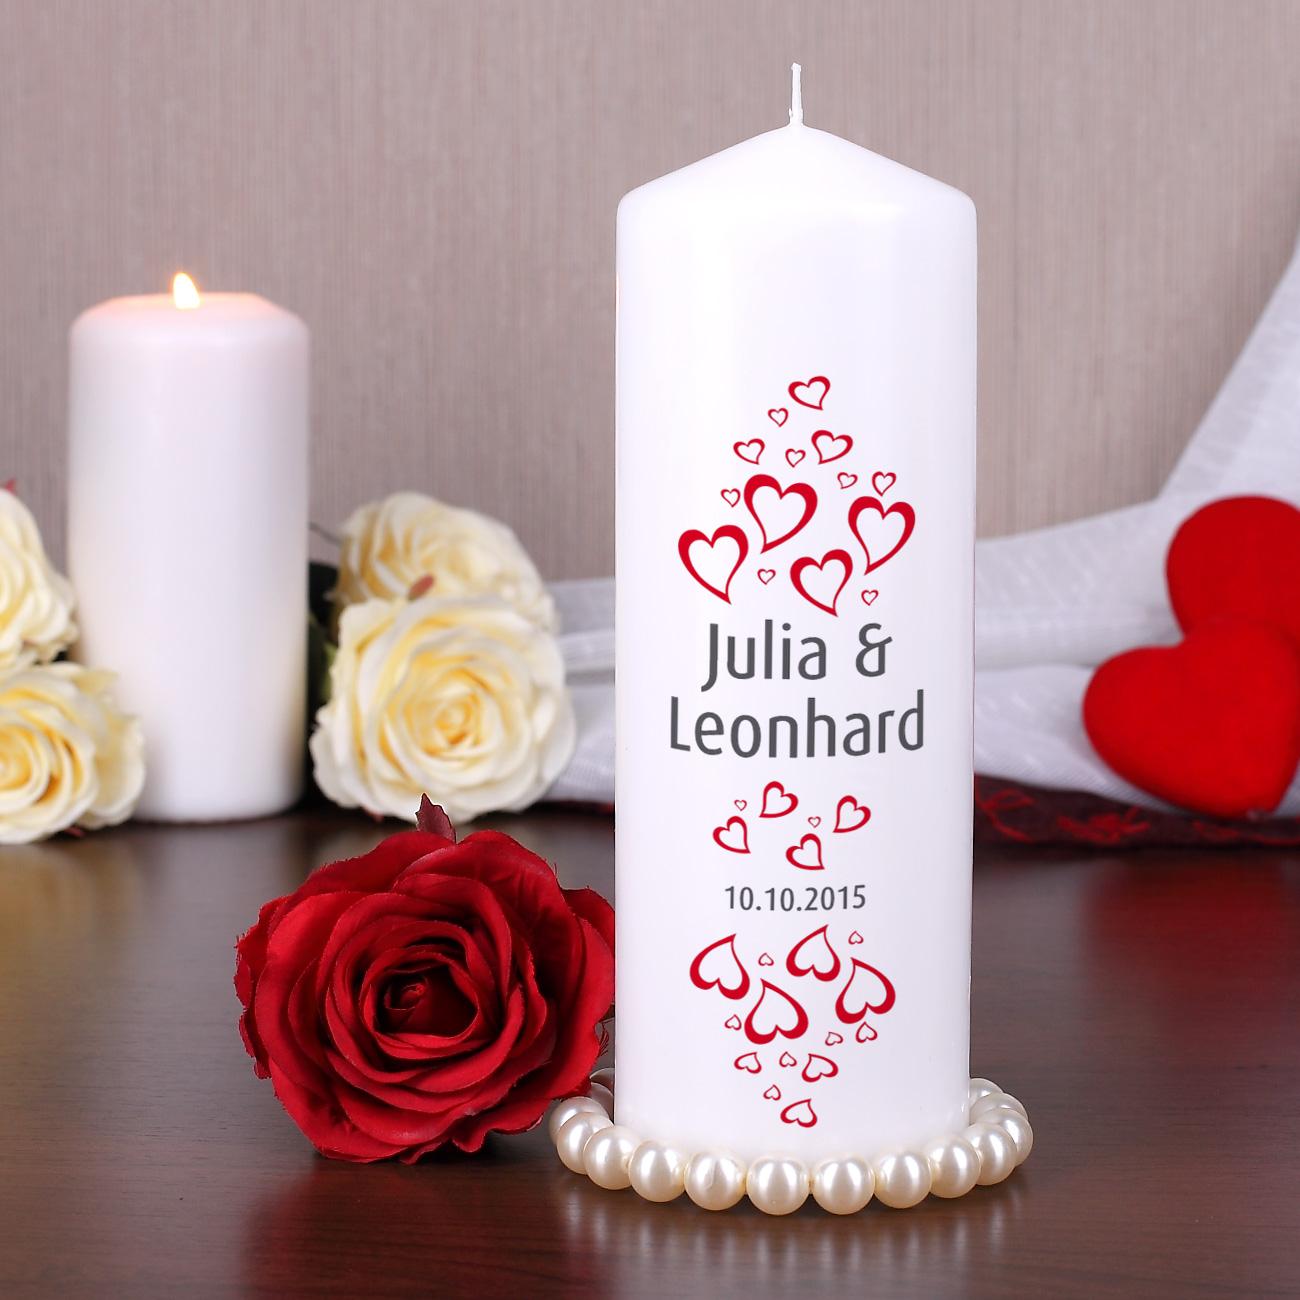 Bedruckte Kerzen  Taufe Hochzeit Geburtstag  Anlass